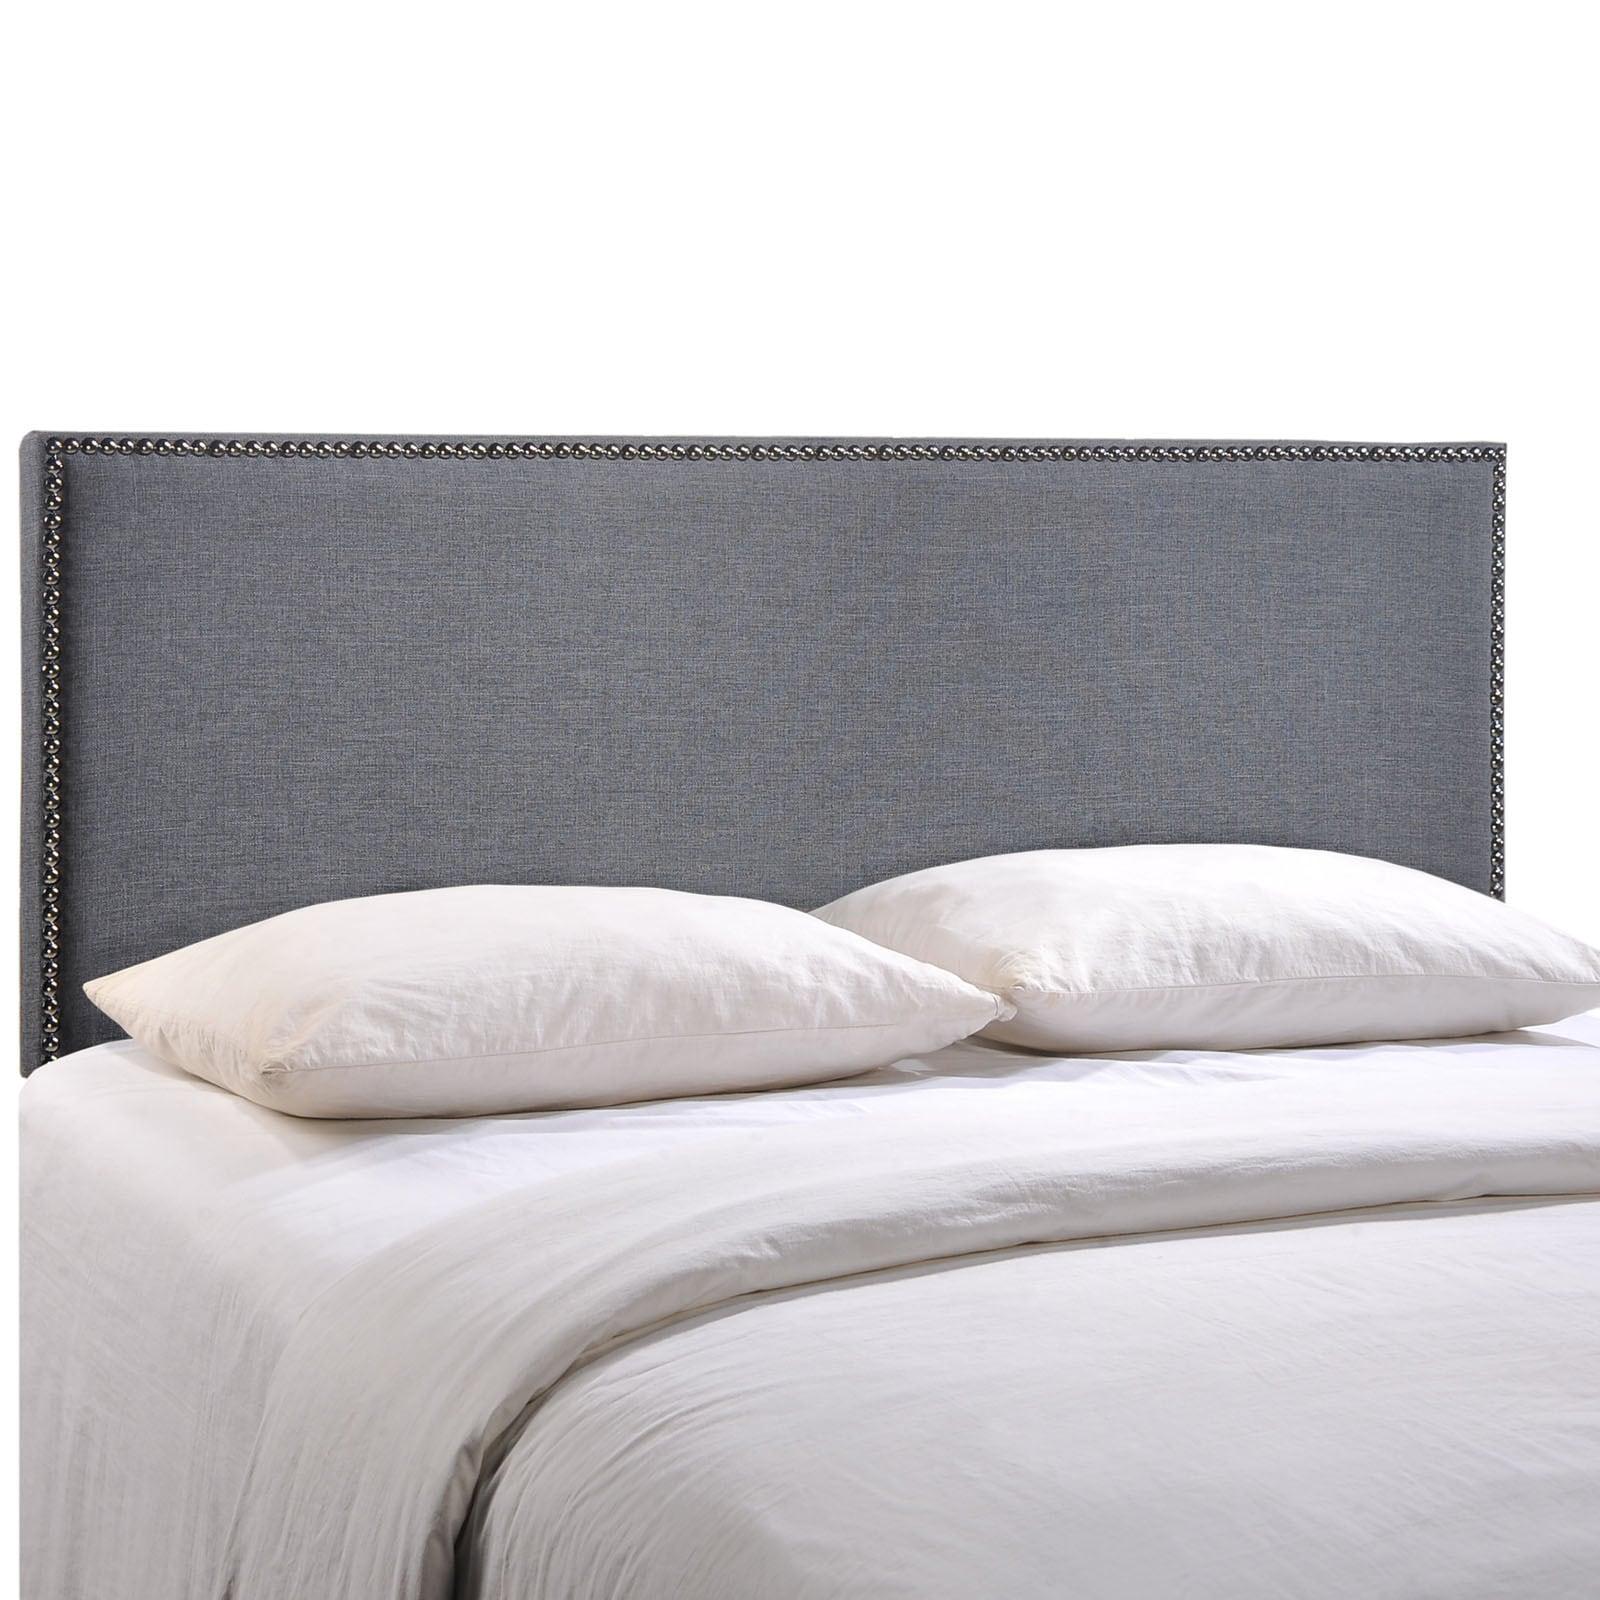 Bedroom Headboards : ... Headboard - Overstock Shopping - Big Discounts on Modway Headboards